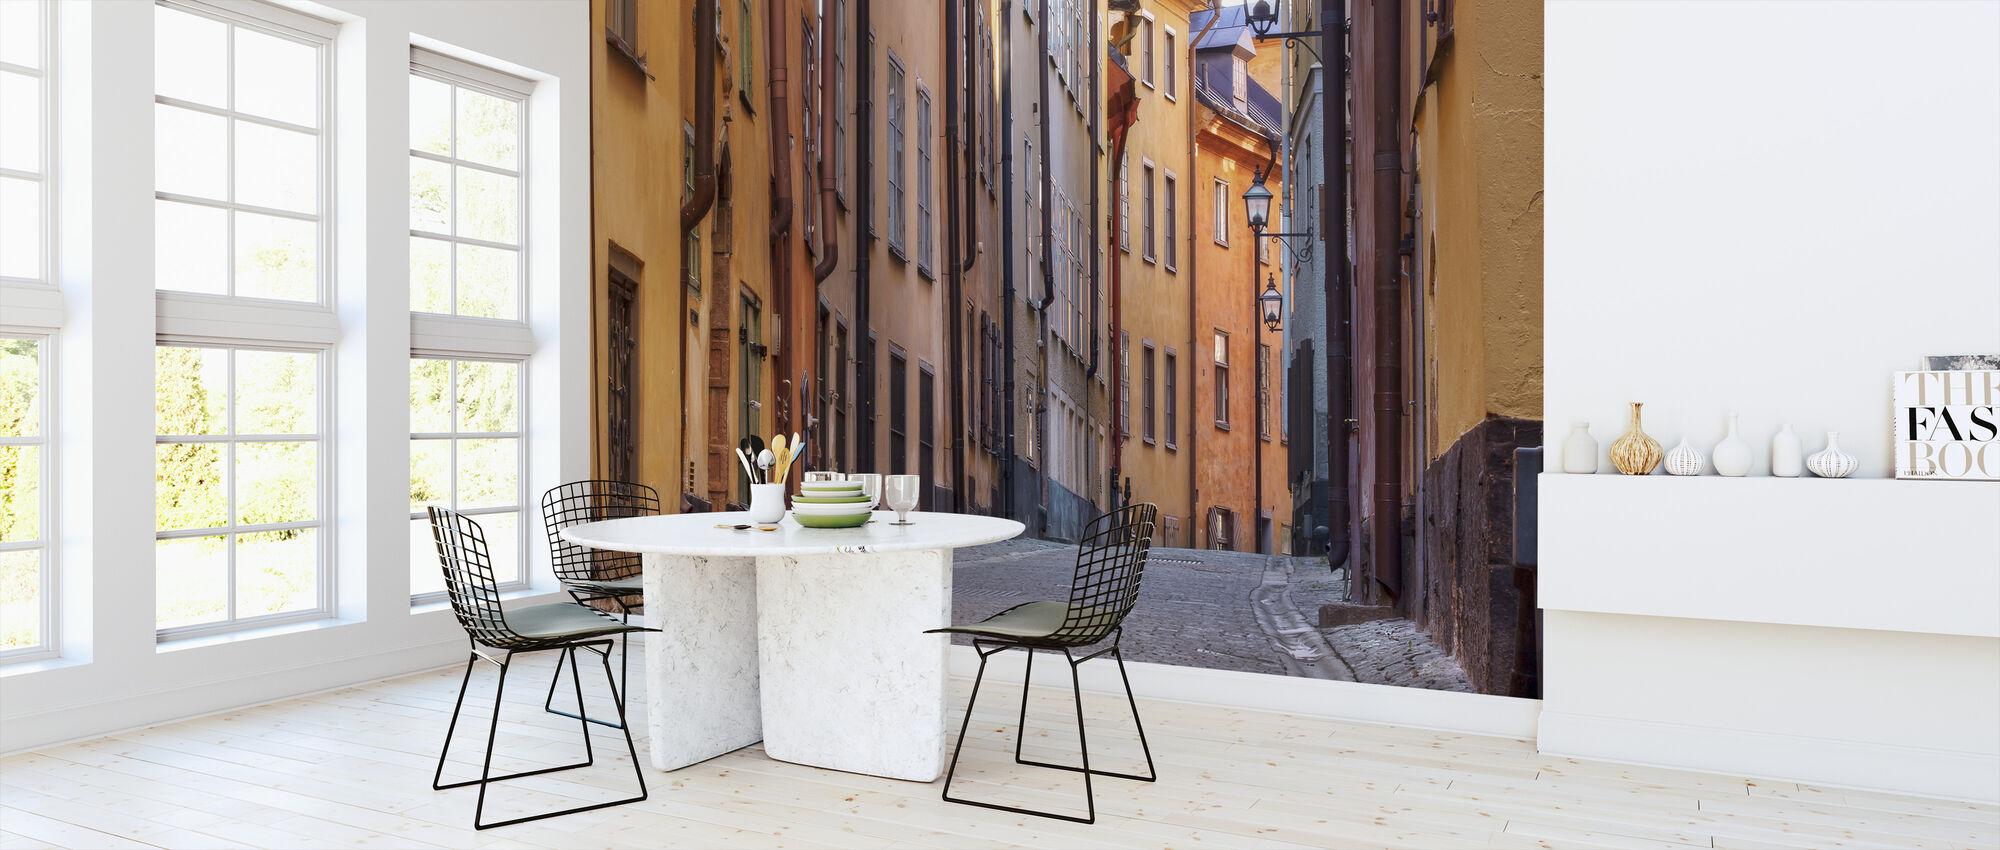 Gata i Stockholm Gamla Stan - Tapet - Kök